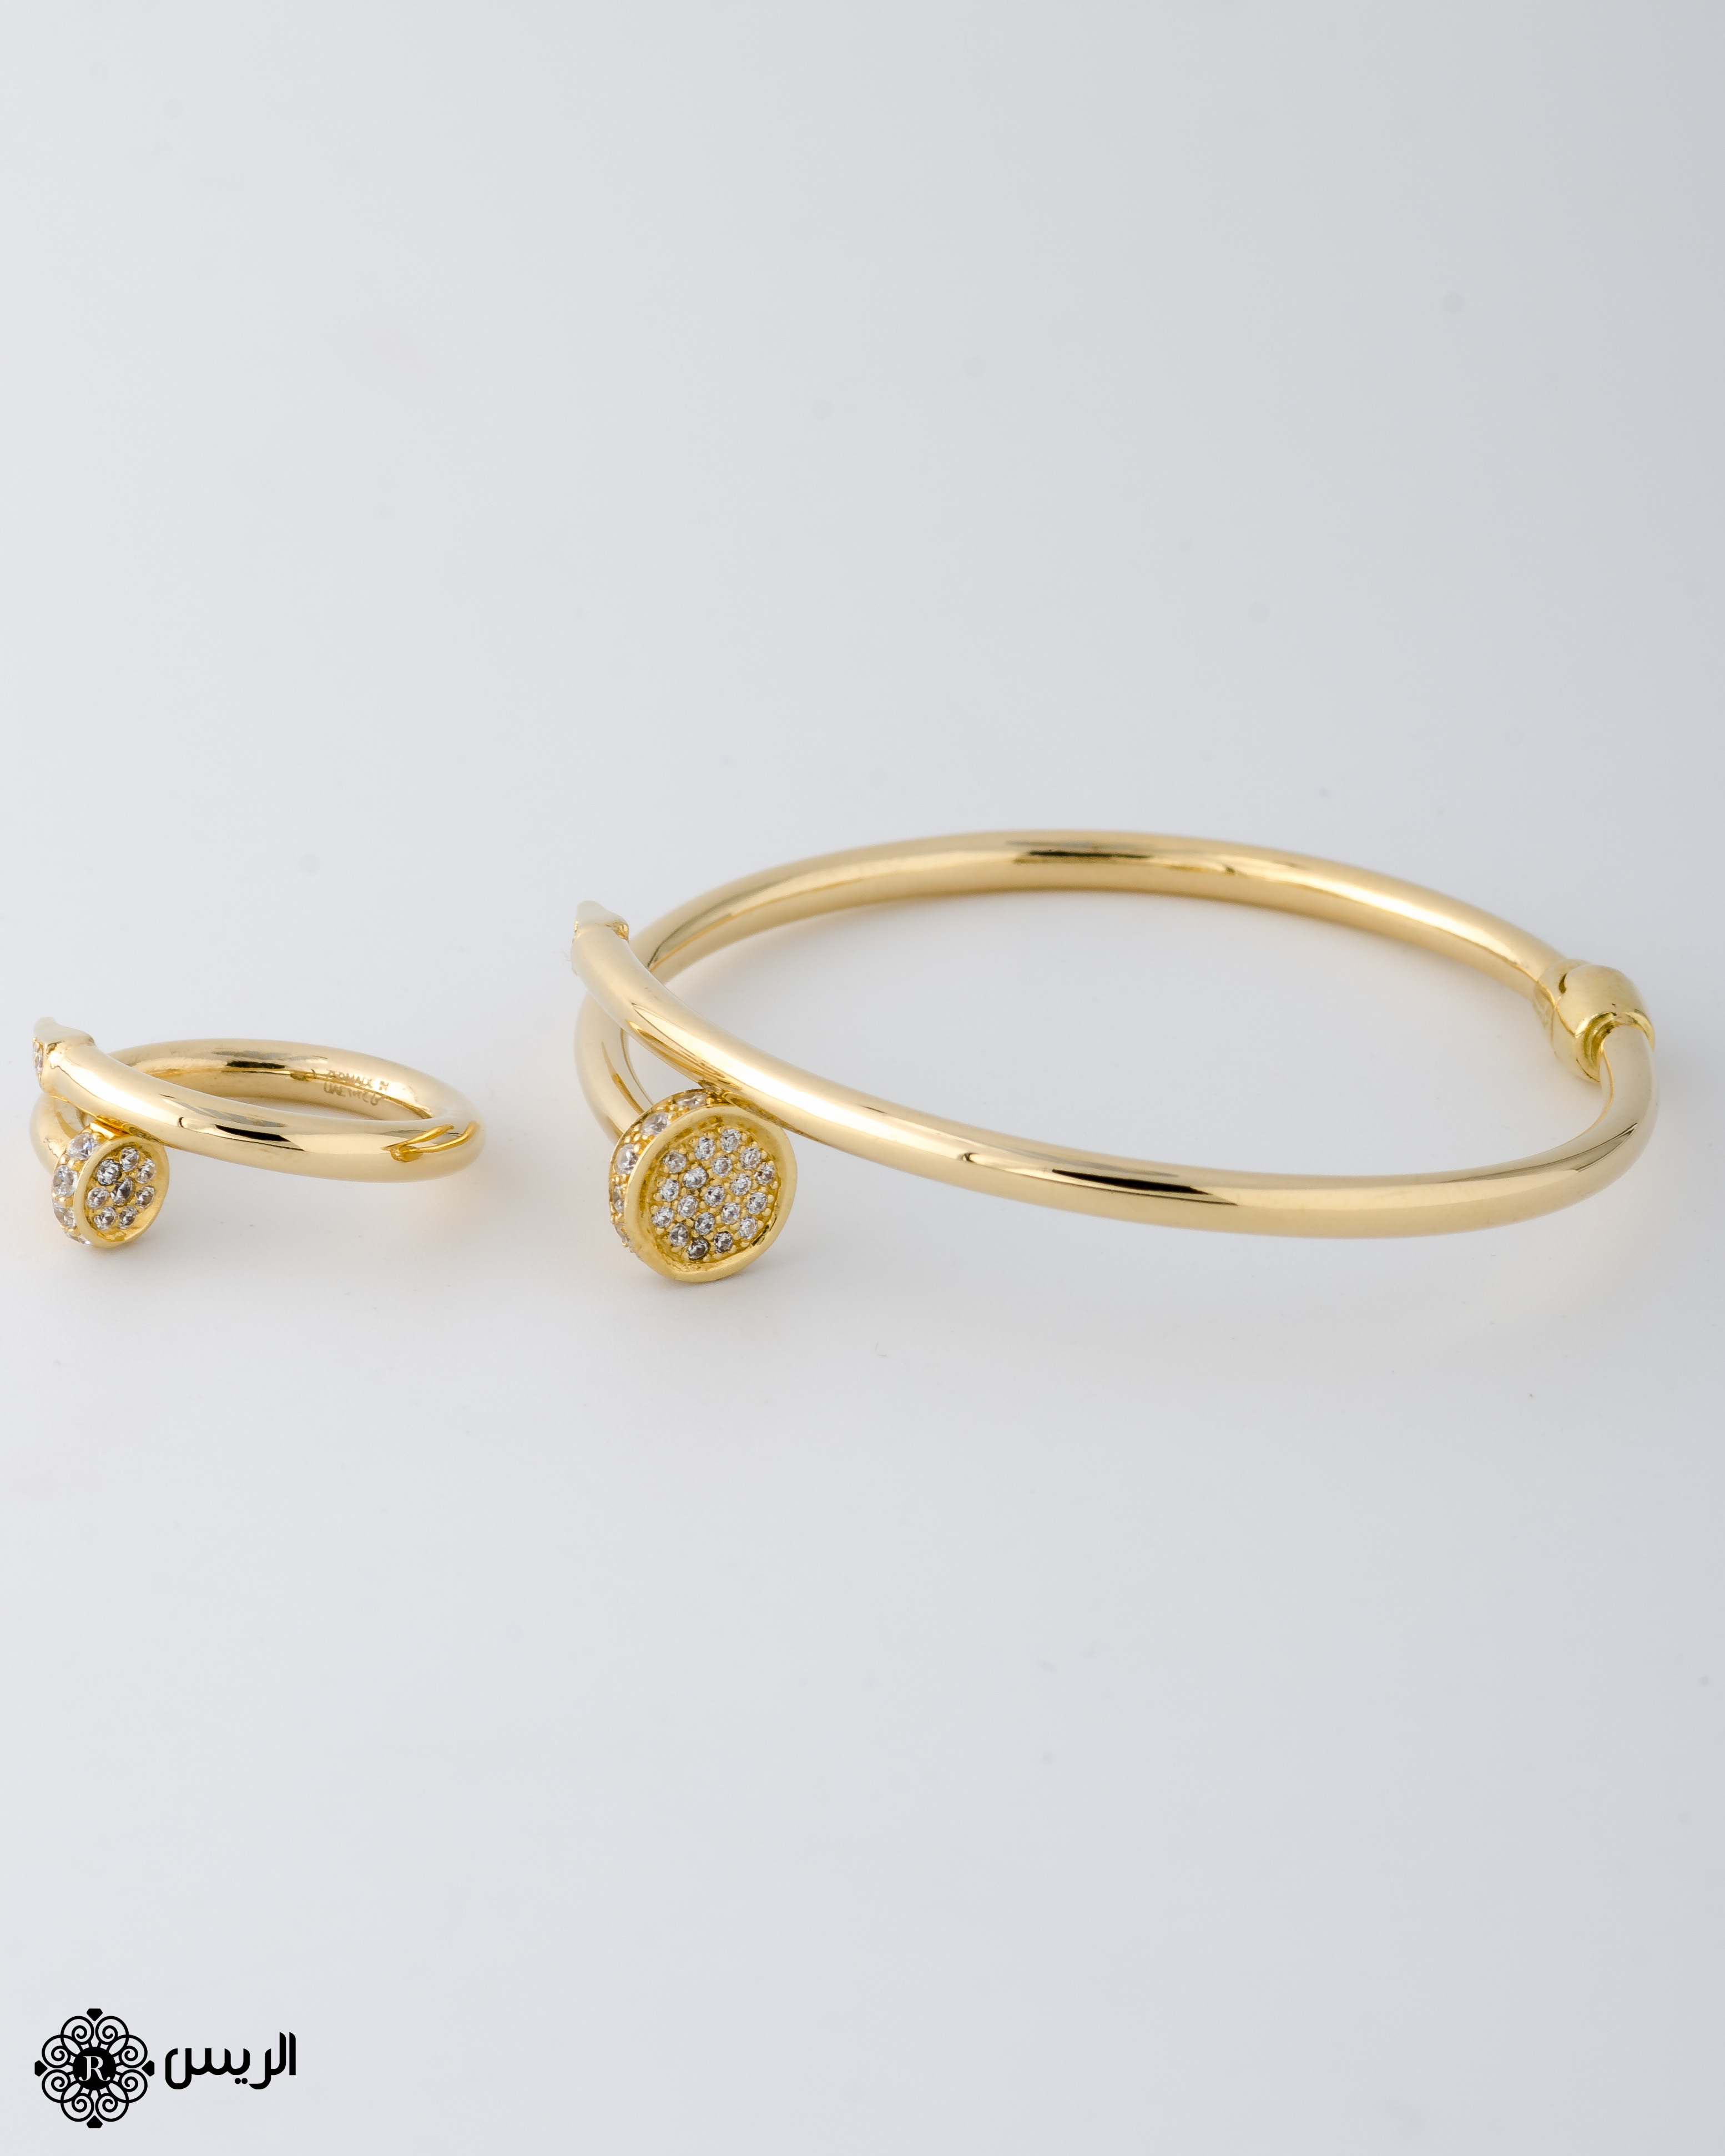 Raies jewelry Bangle Nail with Ring Casual Design إسورة مسمار مع خاتم تصميم سبور الريس للمجوهرات